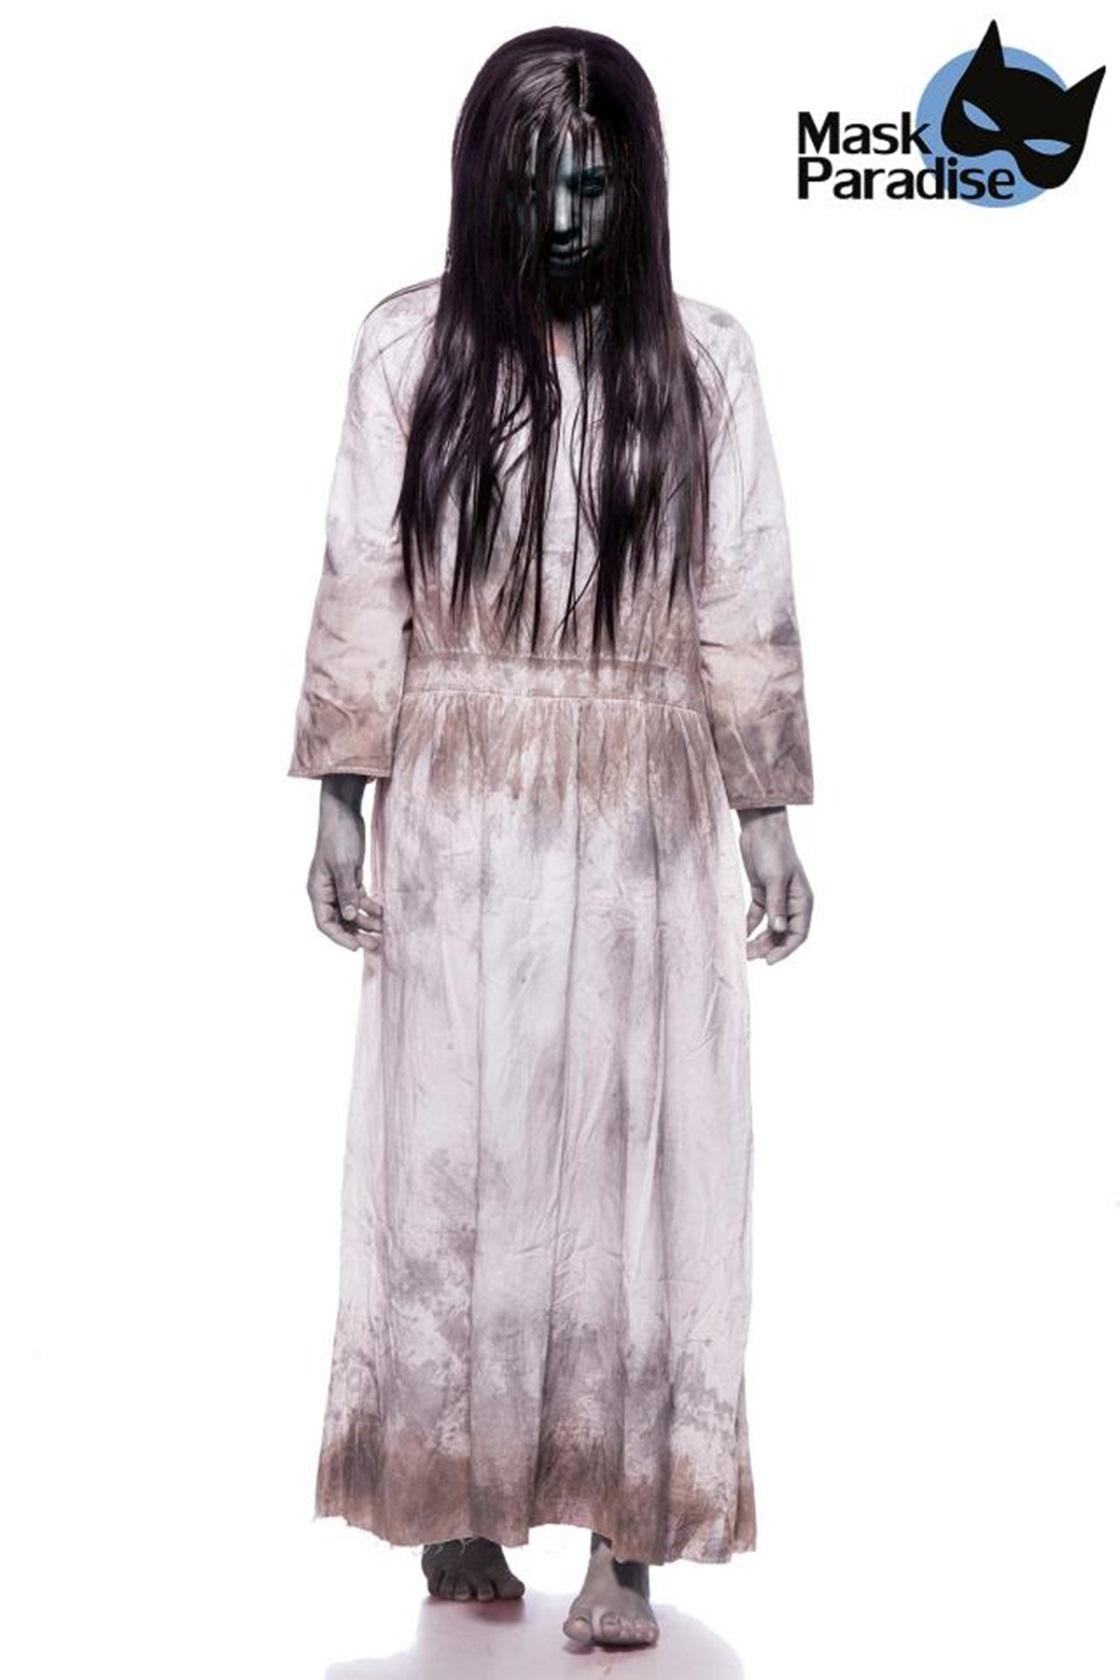 80123 Creepy Girl von MASK PARADISE